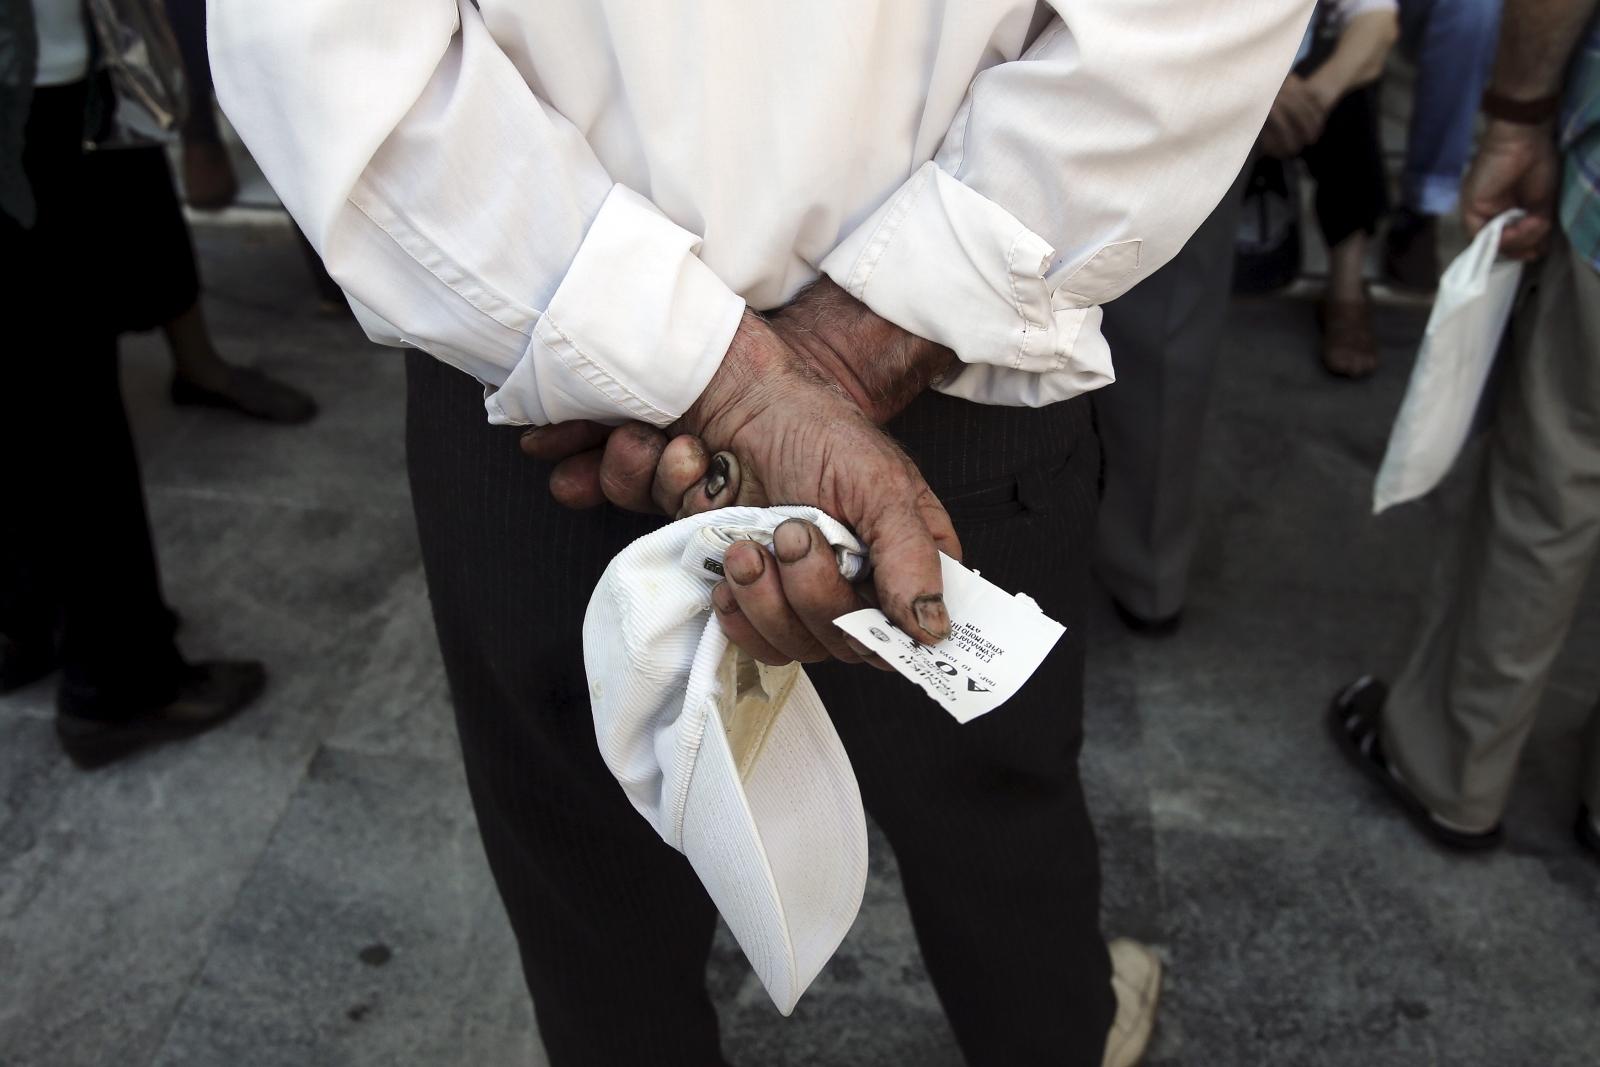 Greek pensioners Athens